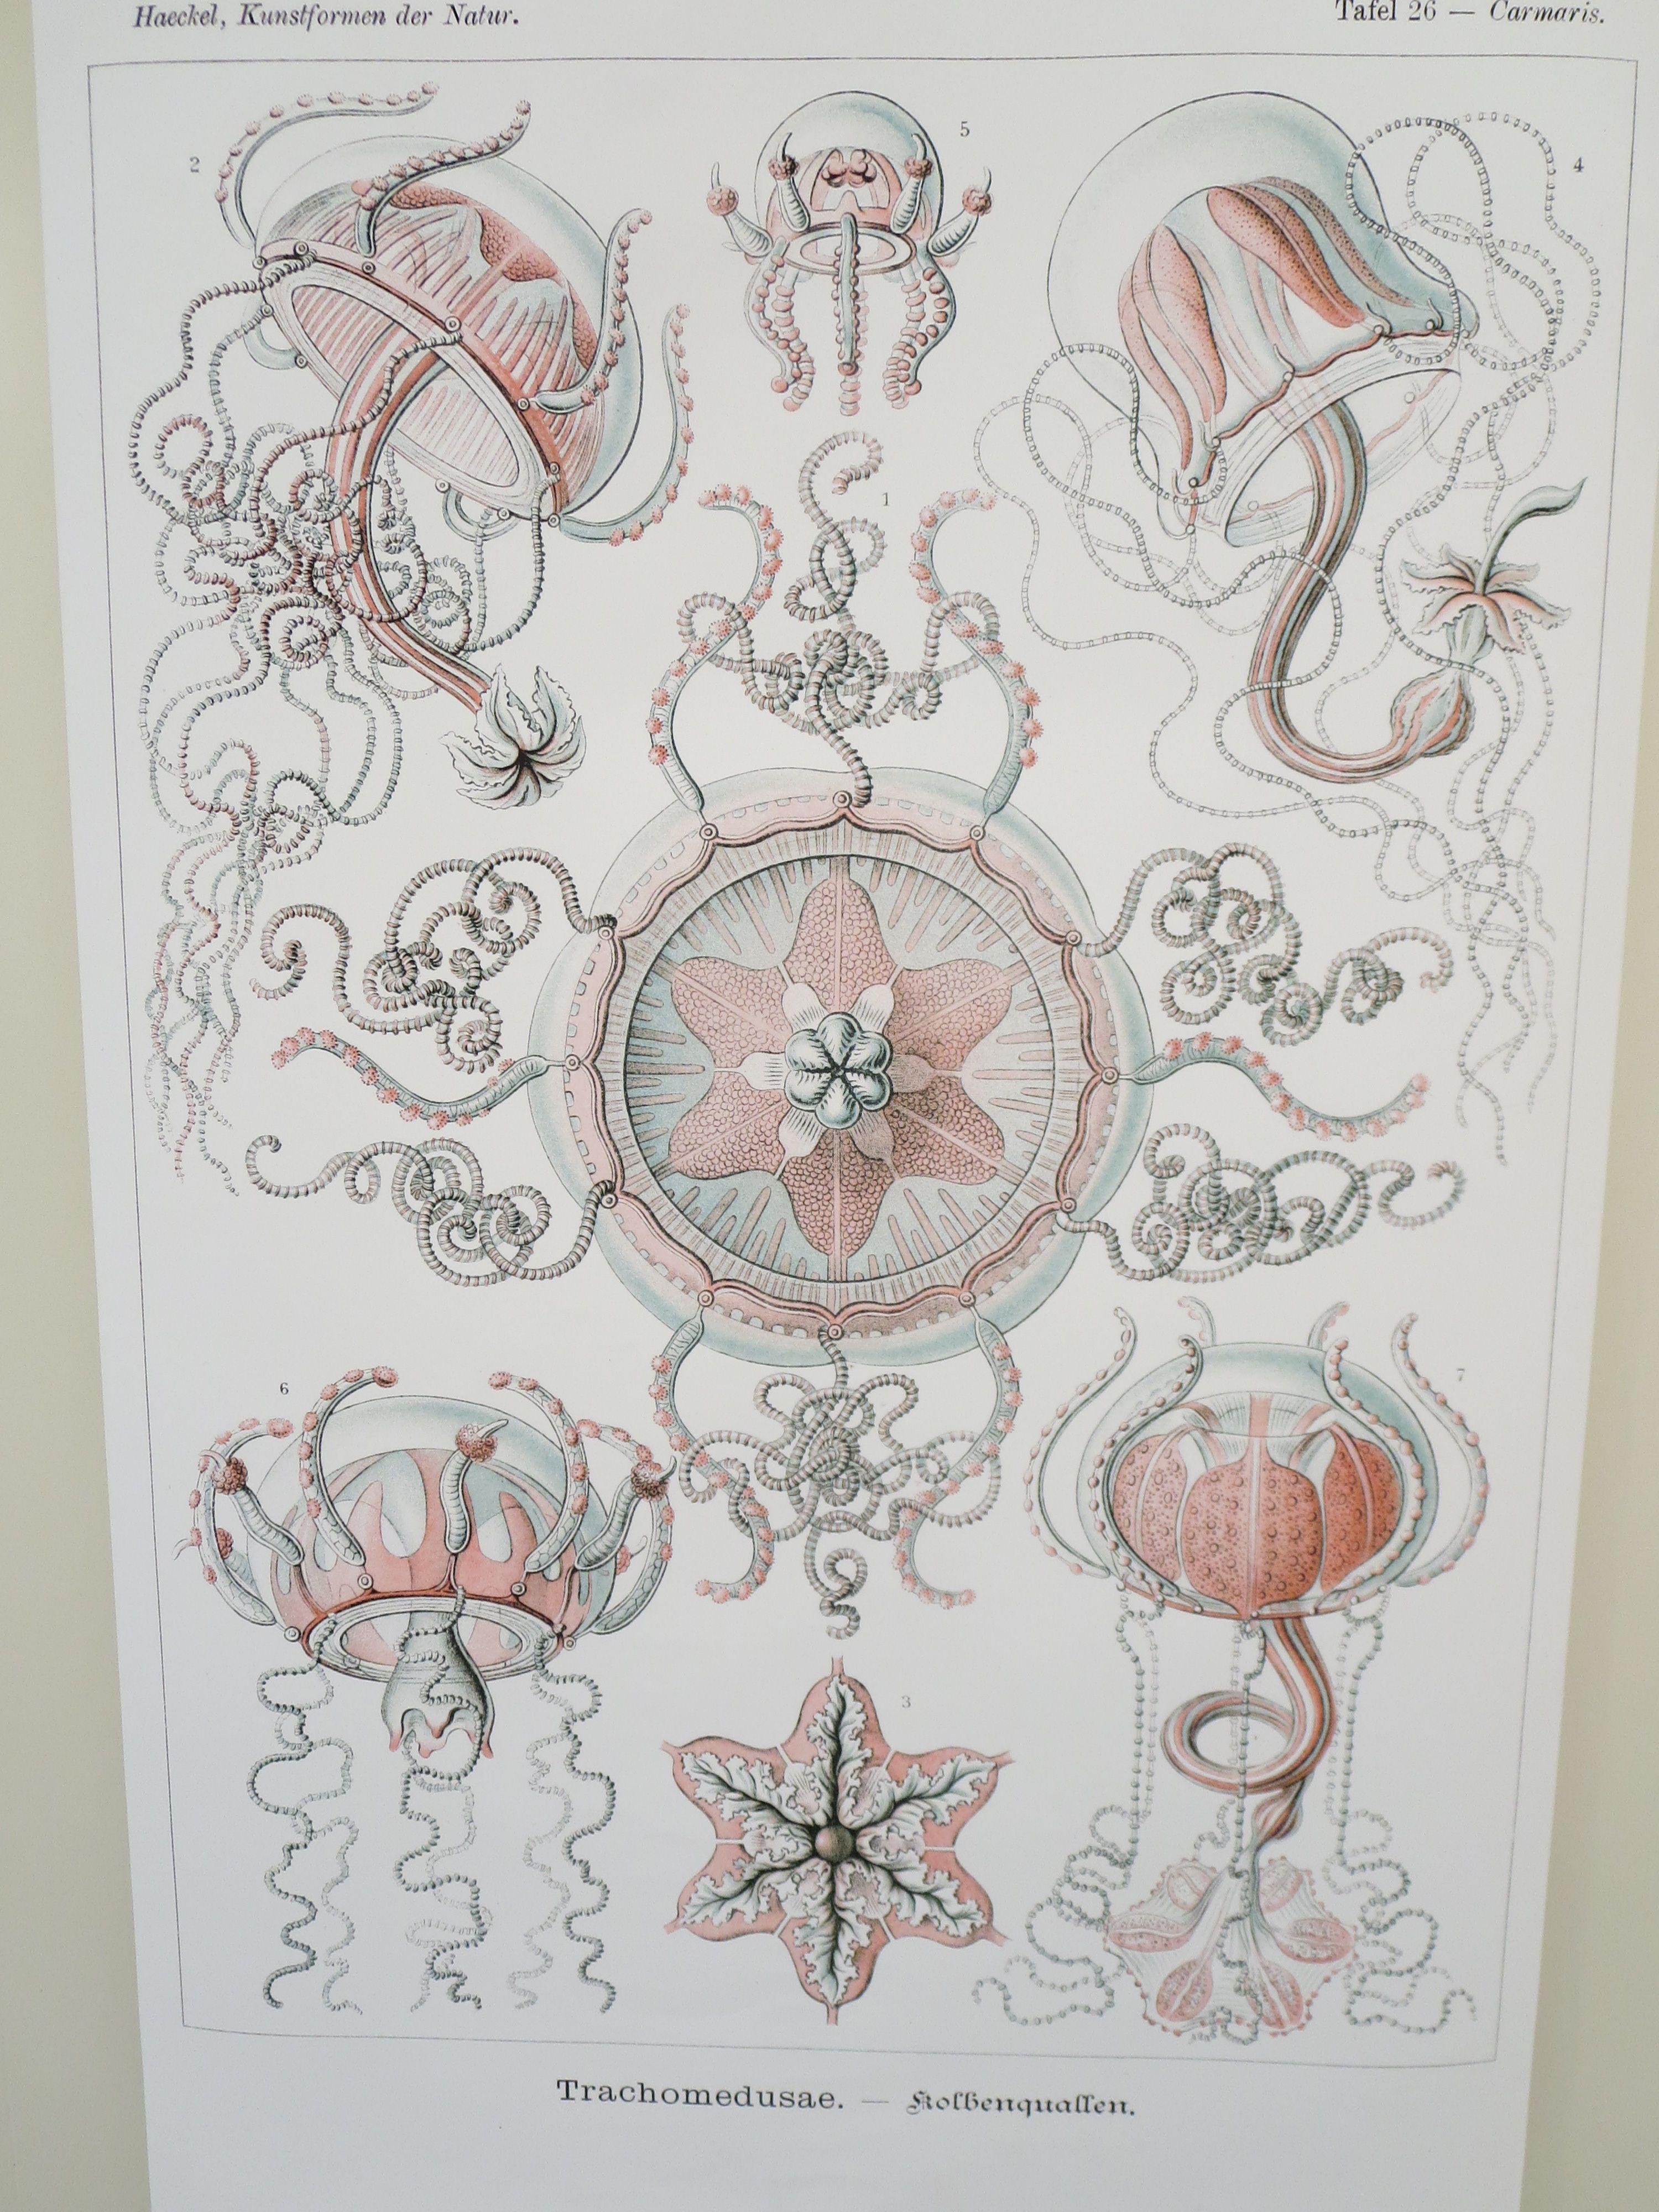 Ernst Haeckel Images